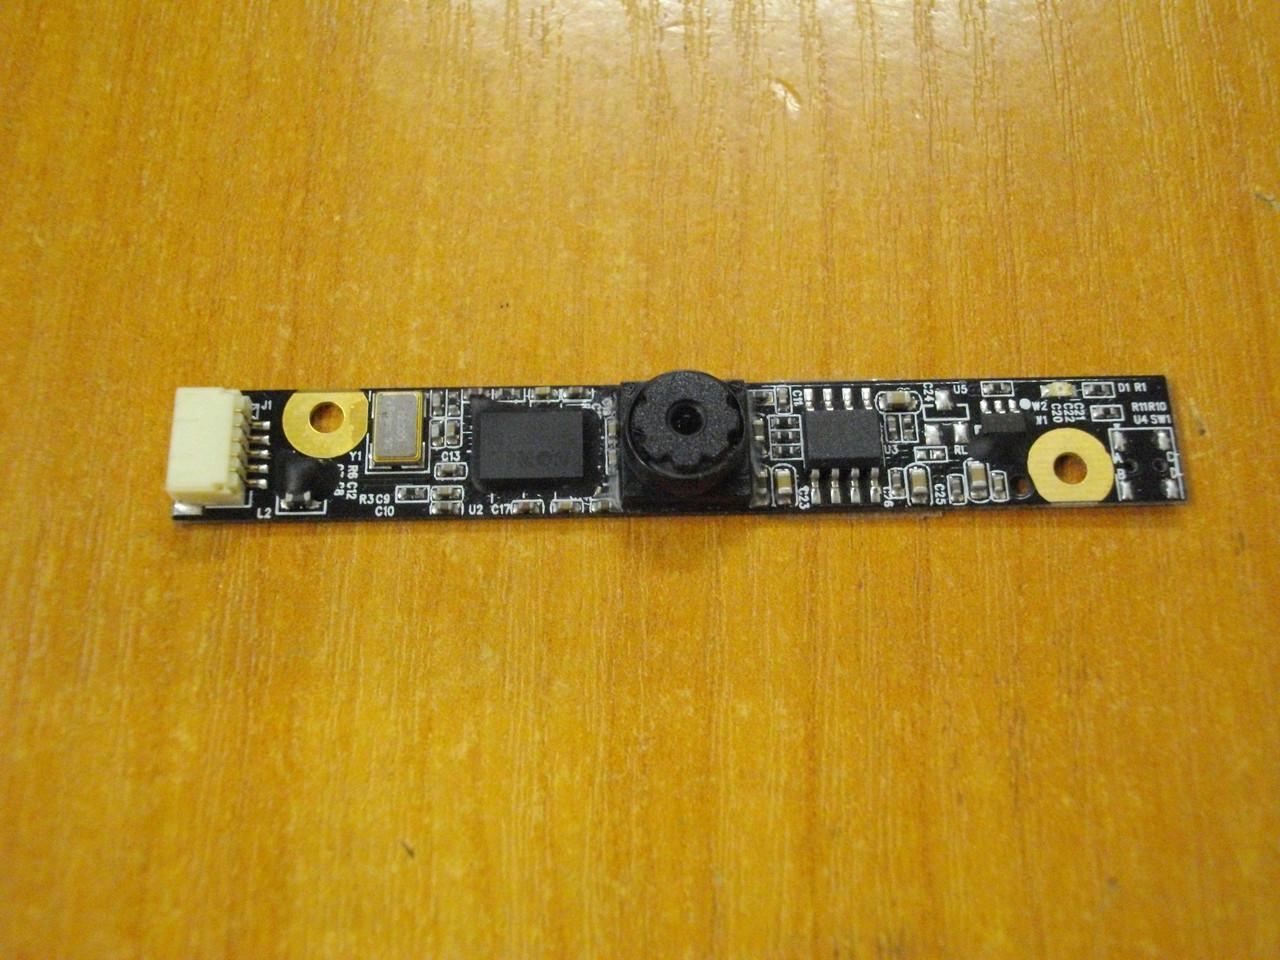 Камера Webcamera CN0314-SN30-OV03-5 Acer Aspire 5536, 5236, MS2265